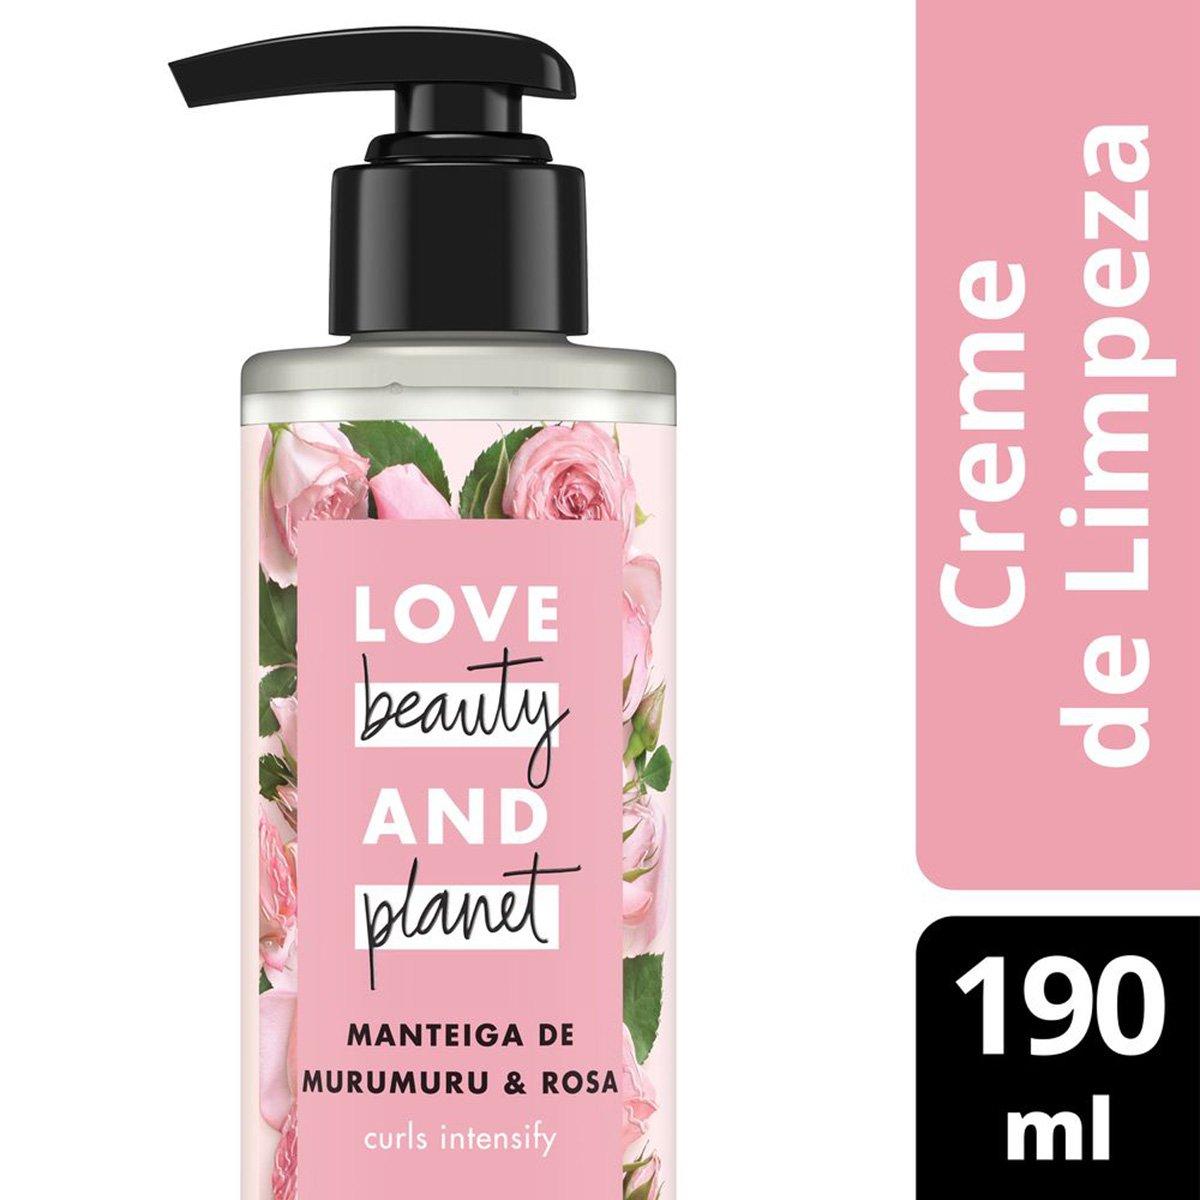 Creme de Limpeza Curls Intensify Manteiga de Murumuru & Rosa Love Beauty and Planet 190ml